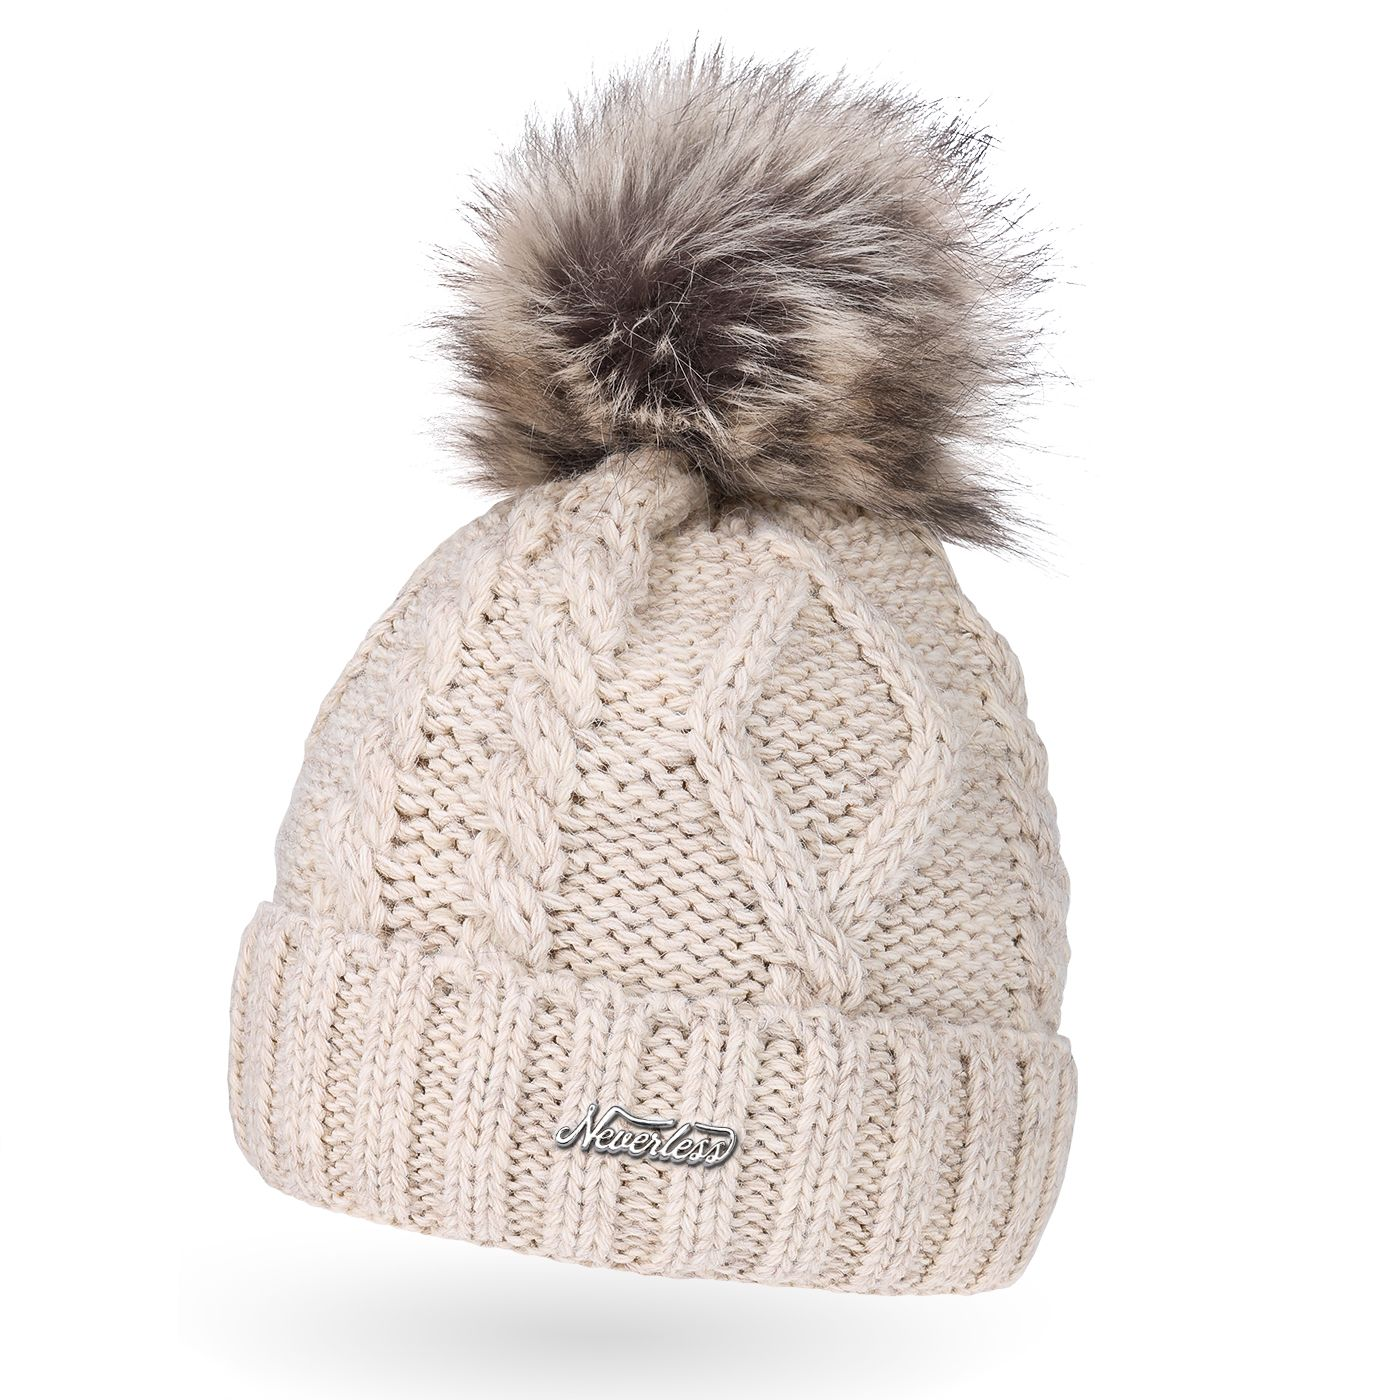 Neverless/® gef/ütterte Damen Strickm/ütze mit Doppel-Fell-Bommel und Fleece Futter Winter-M/ütze Bommelm/ütze